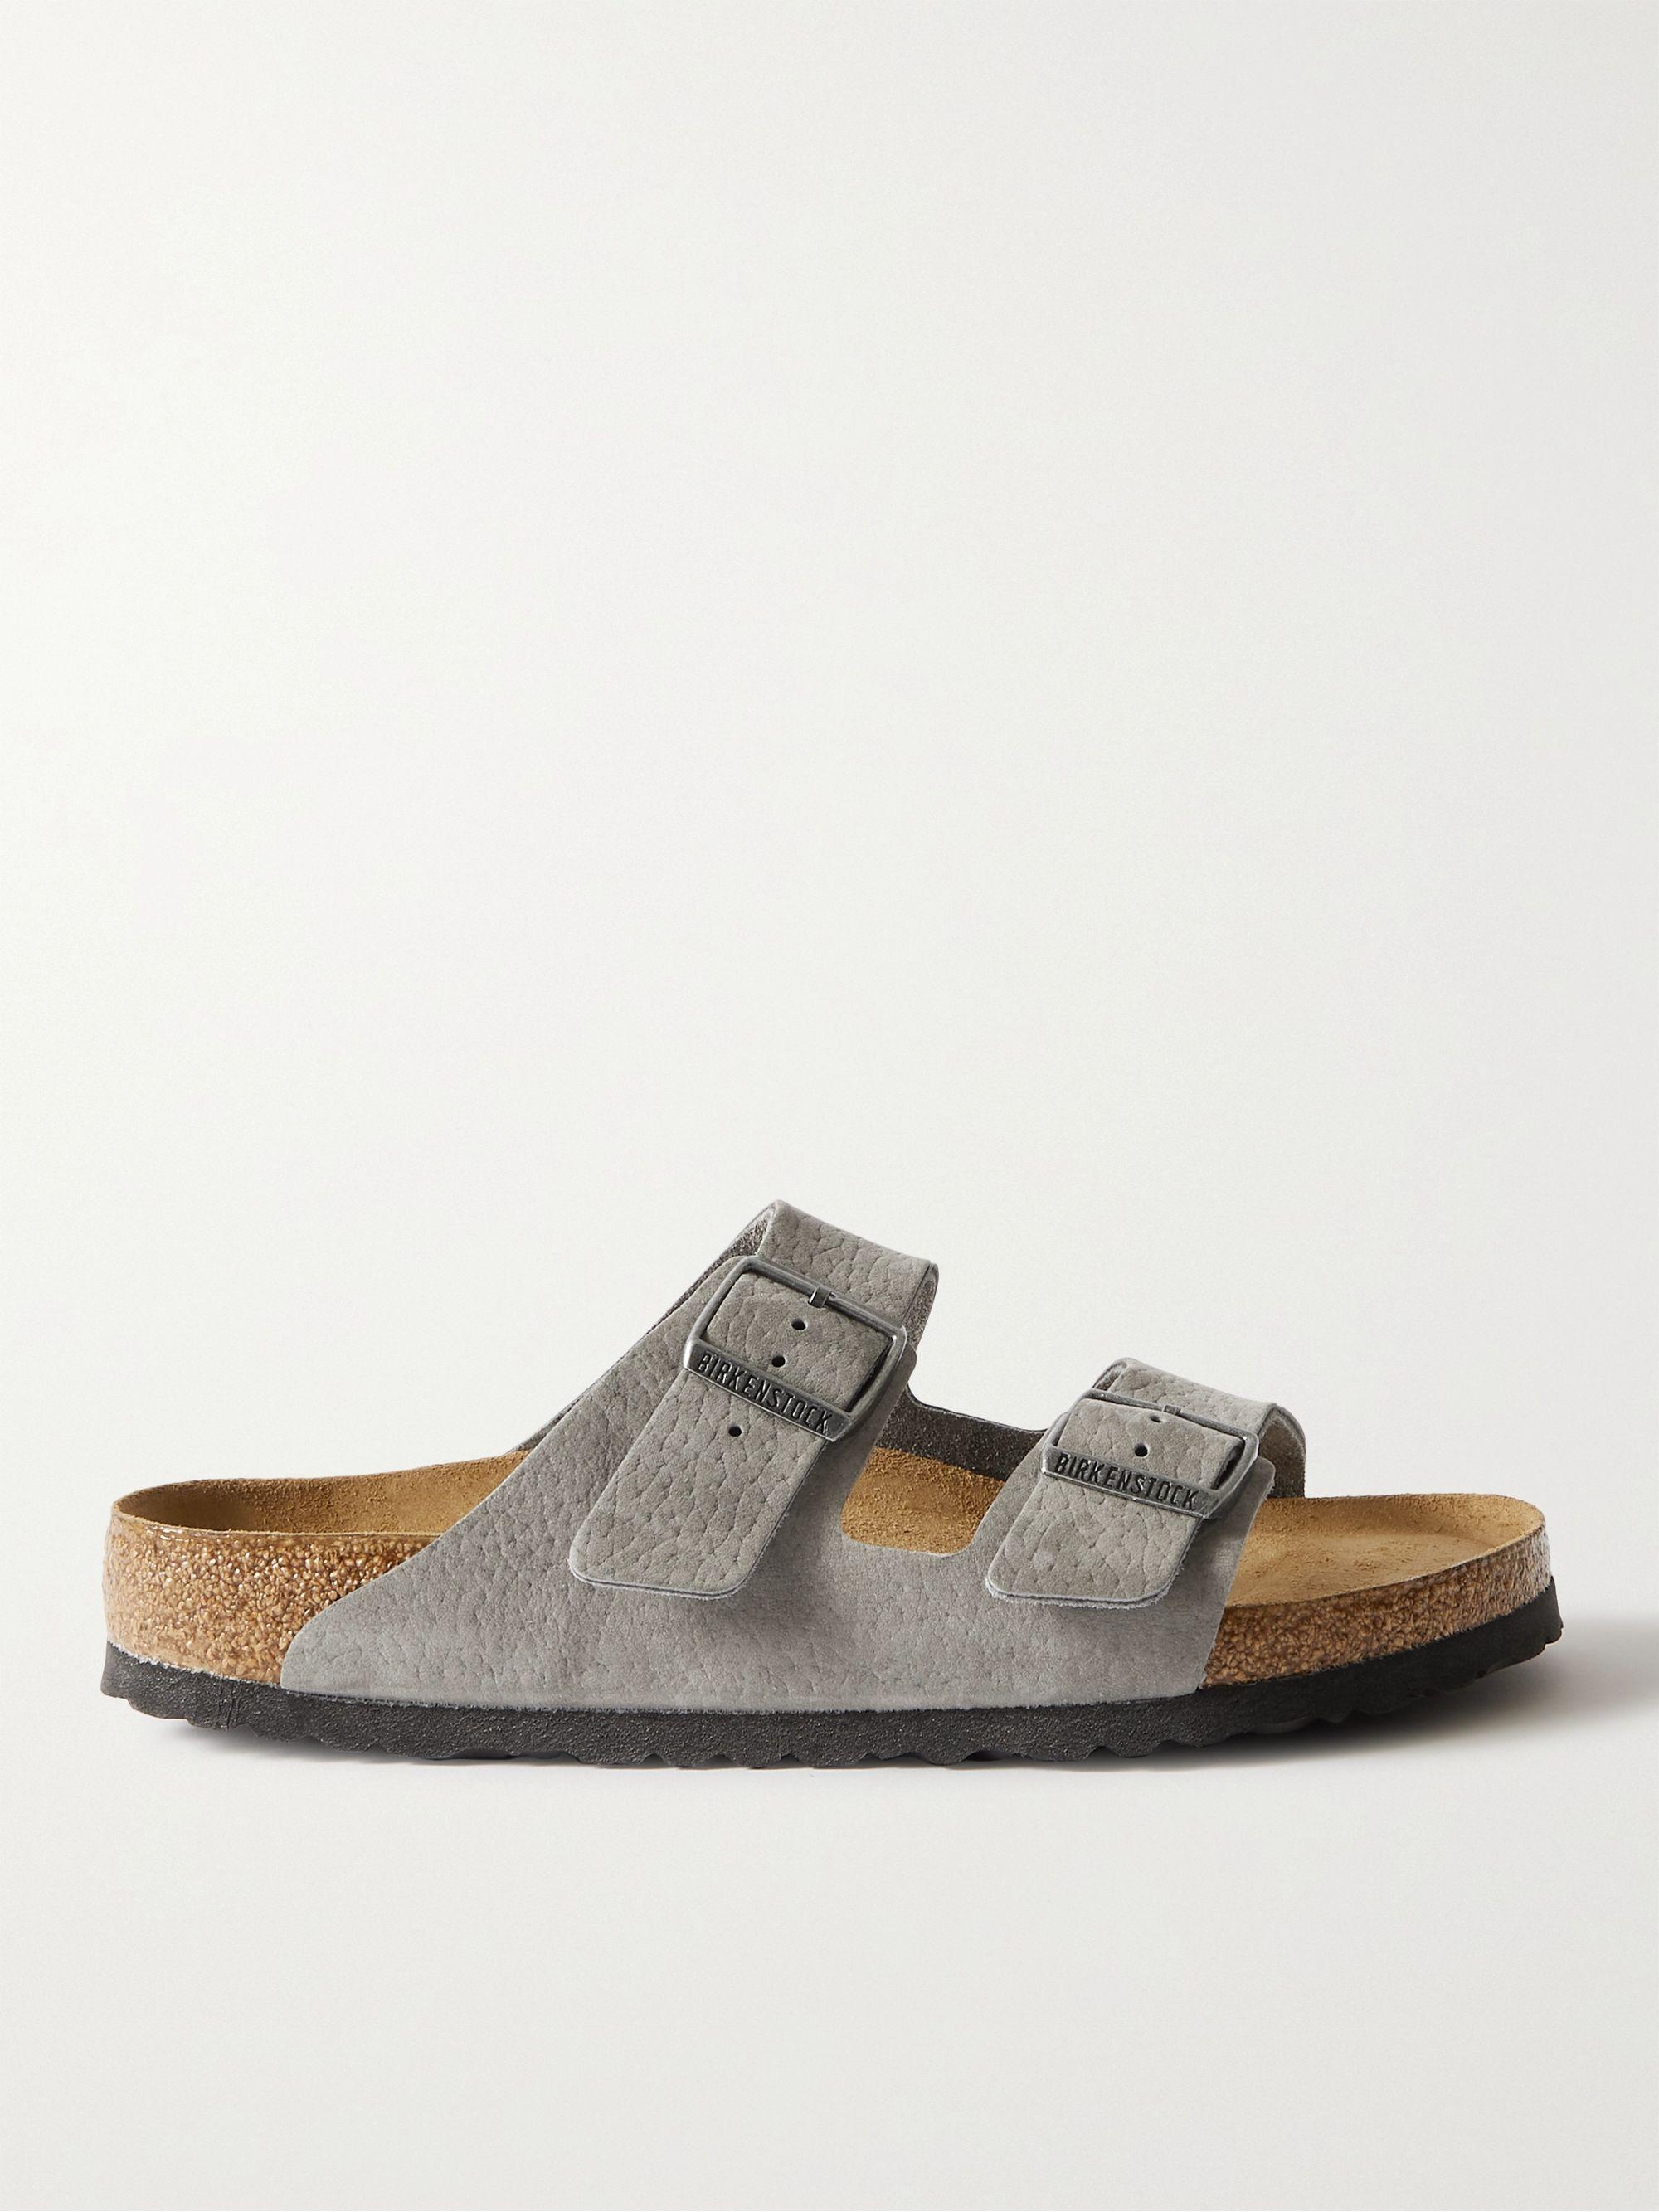 Birkenstock Arizona Nubuck Sandals,Gray